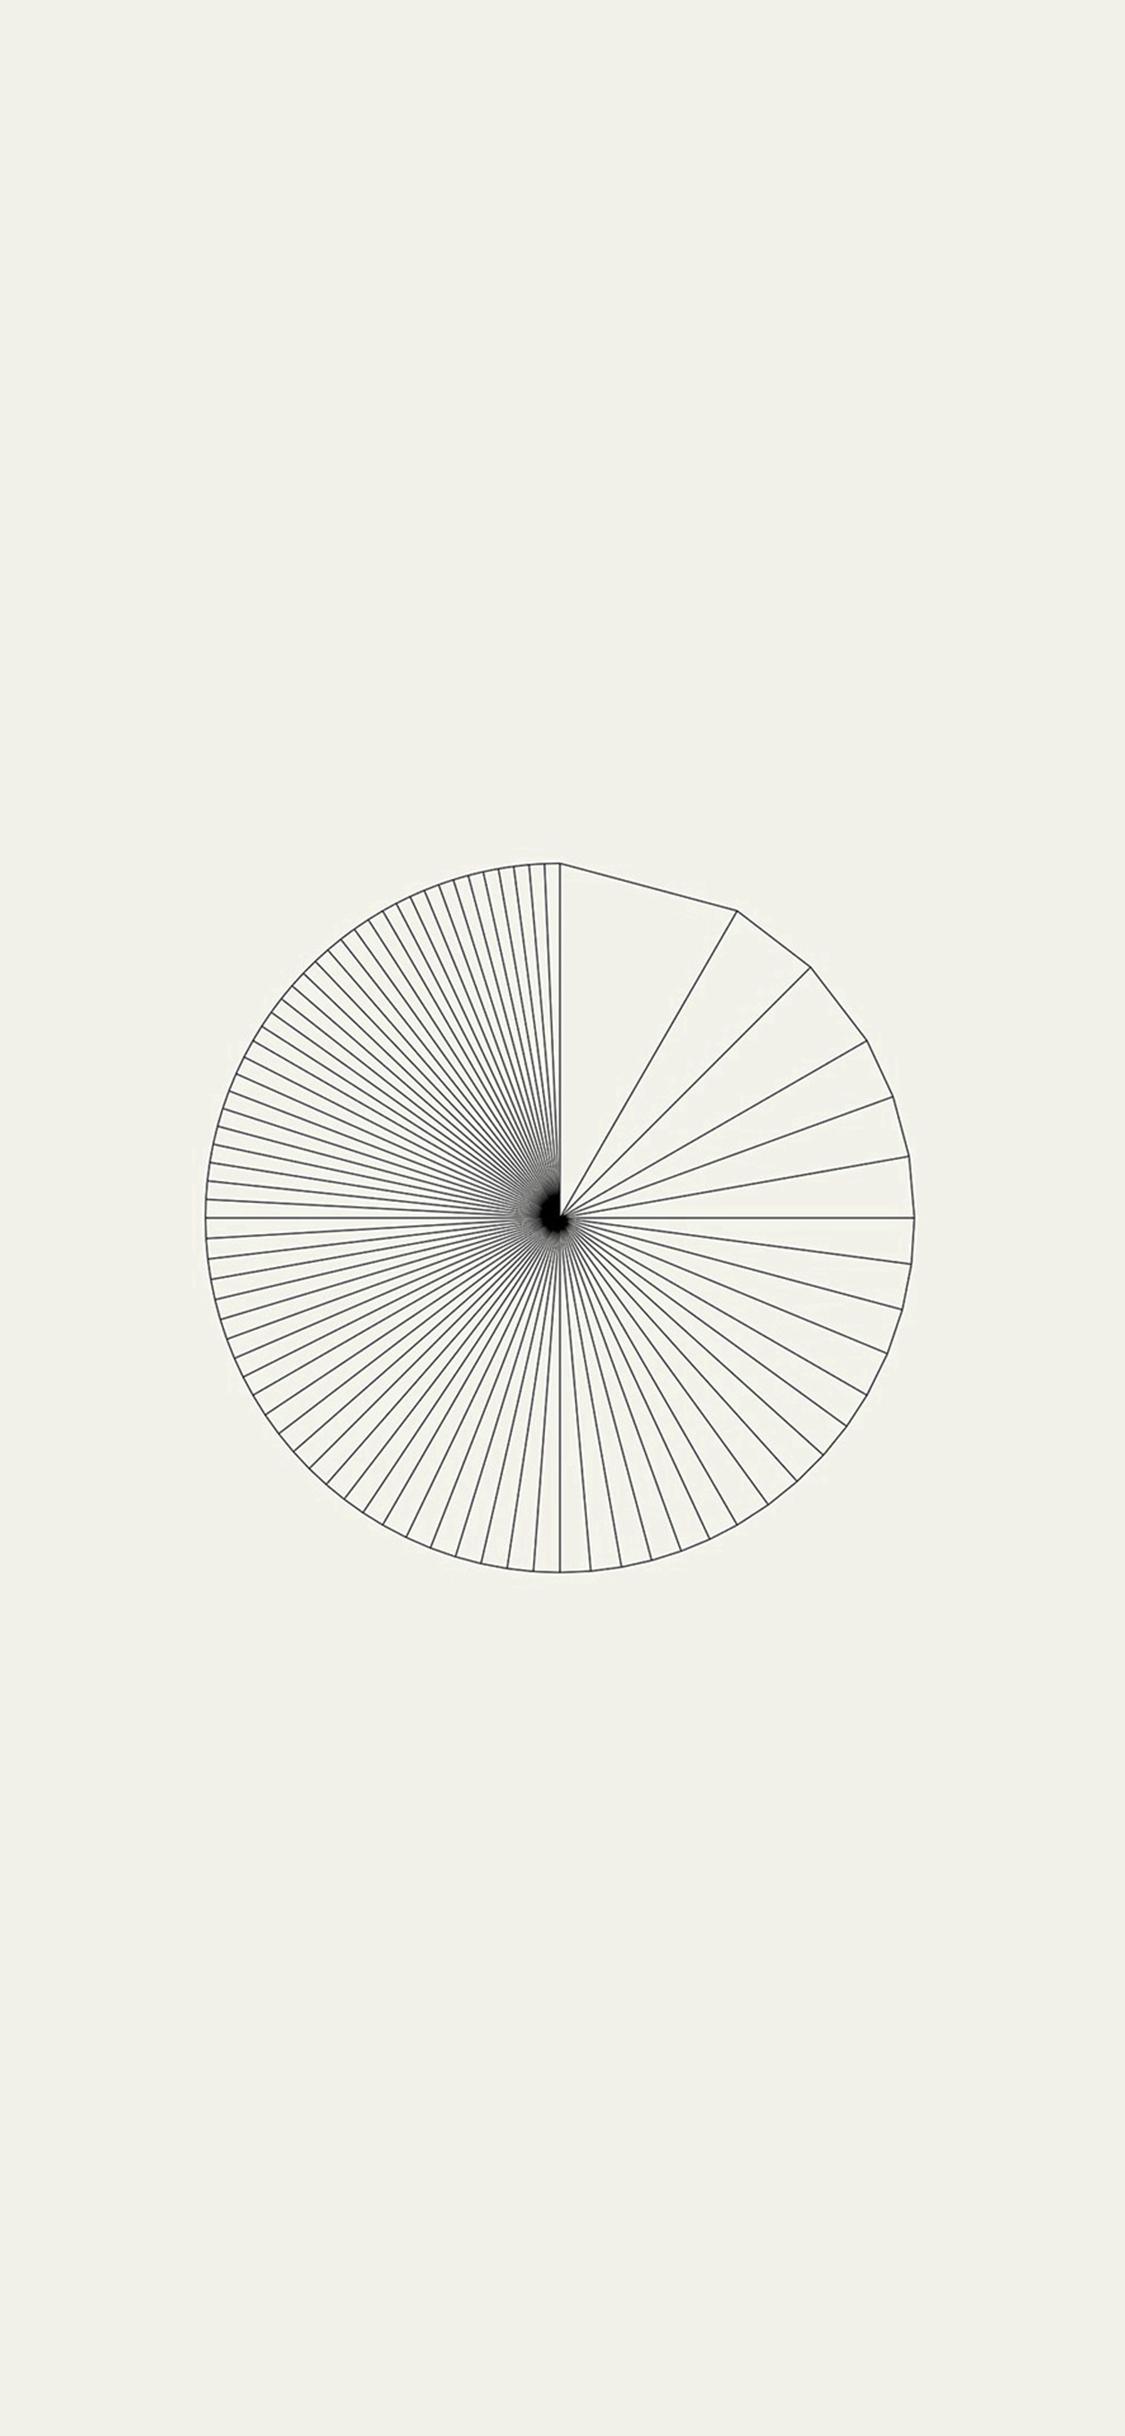 Slides Minimal Art Simple iPhone X Wallpapers Free Download